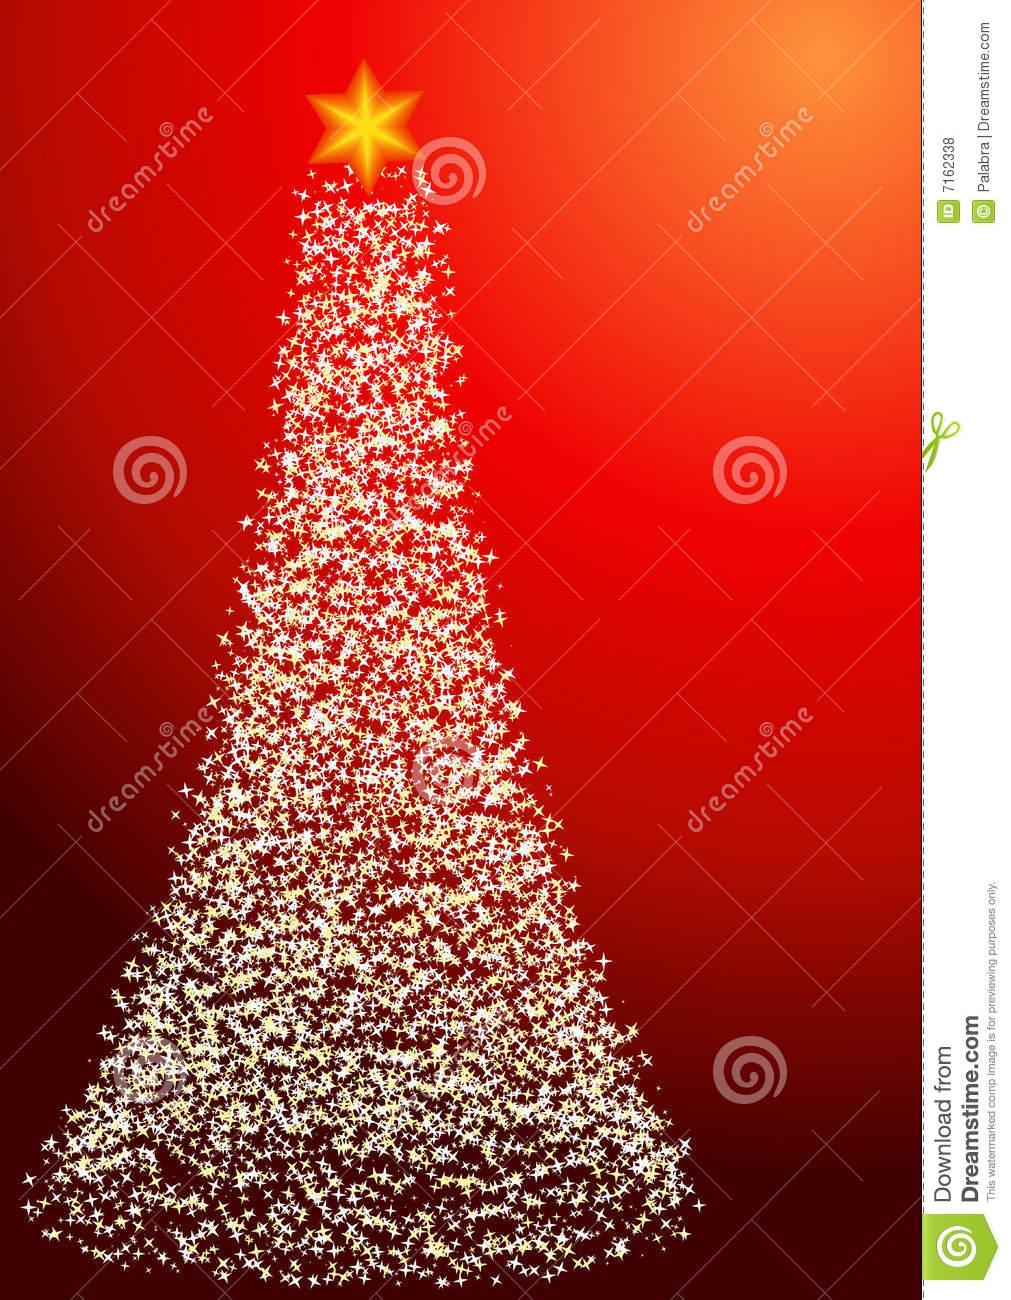 Free Download 22 Christmas Background Portrait Orientation